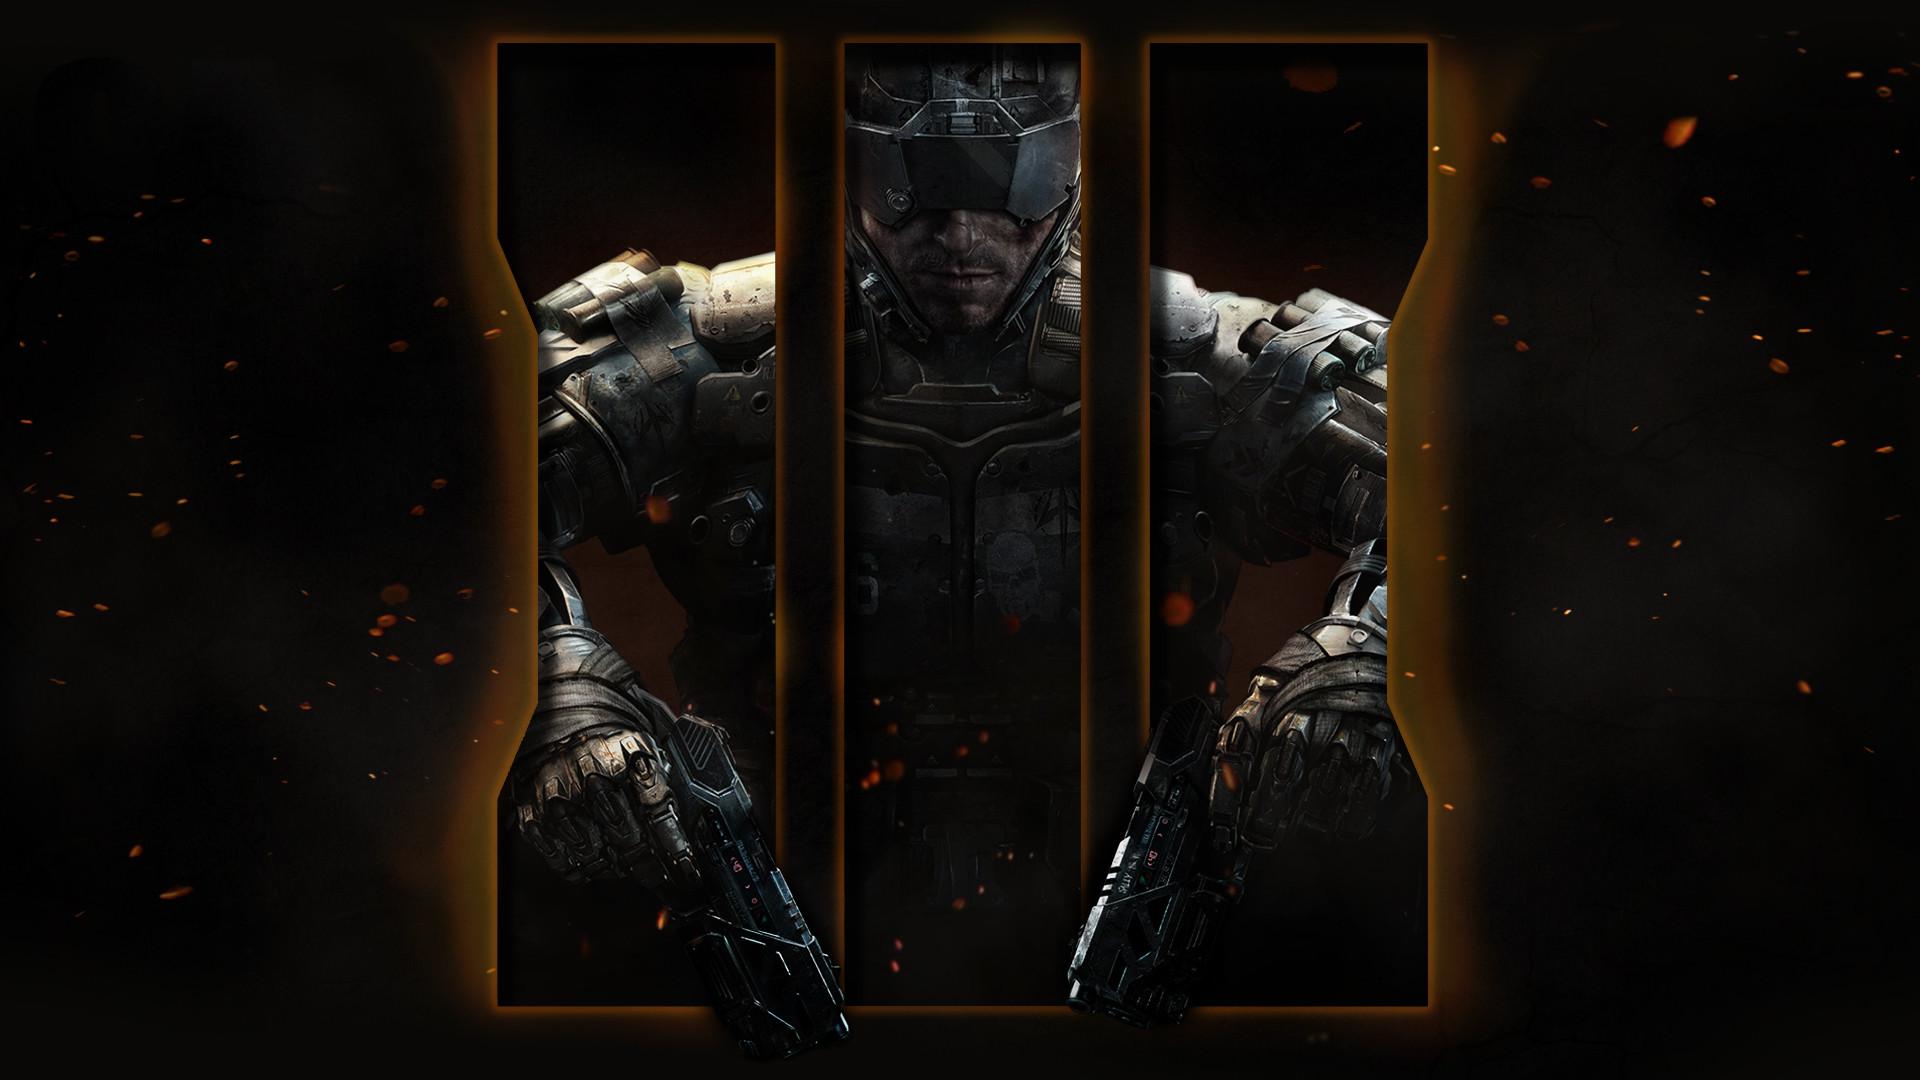 … Call of Duty: Black Ops III Wallpaper …